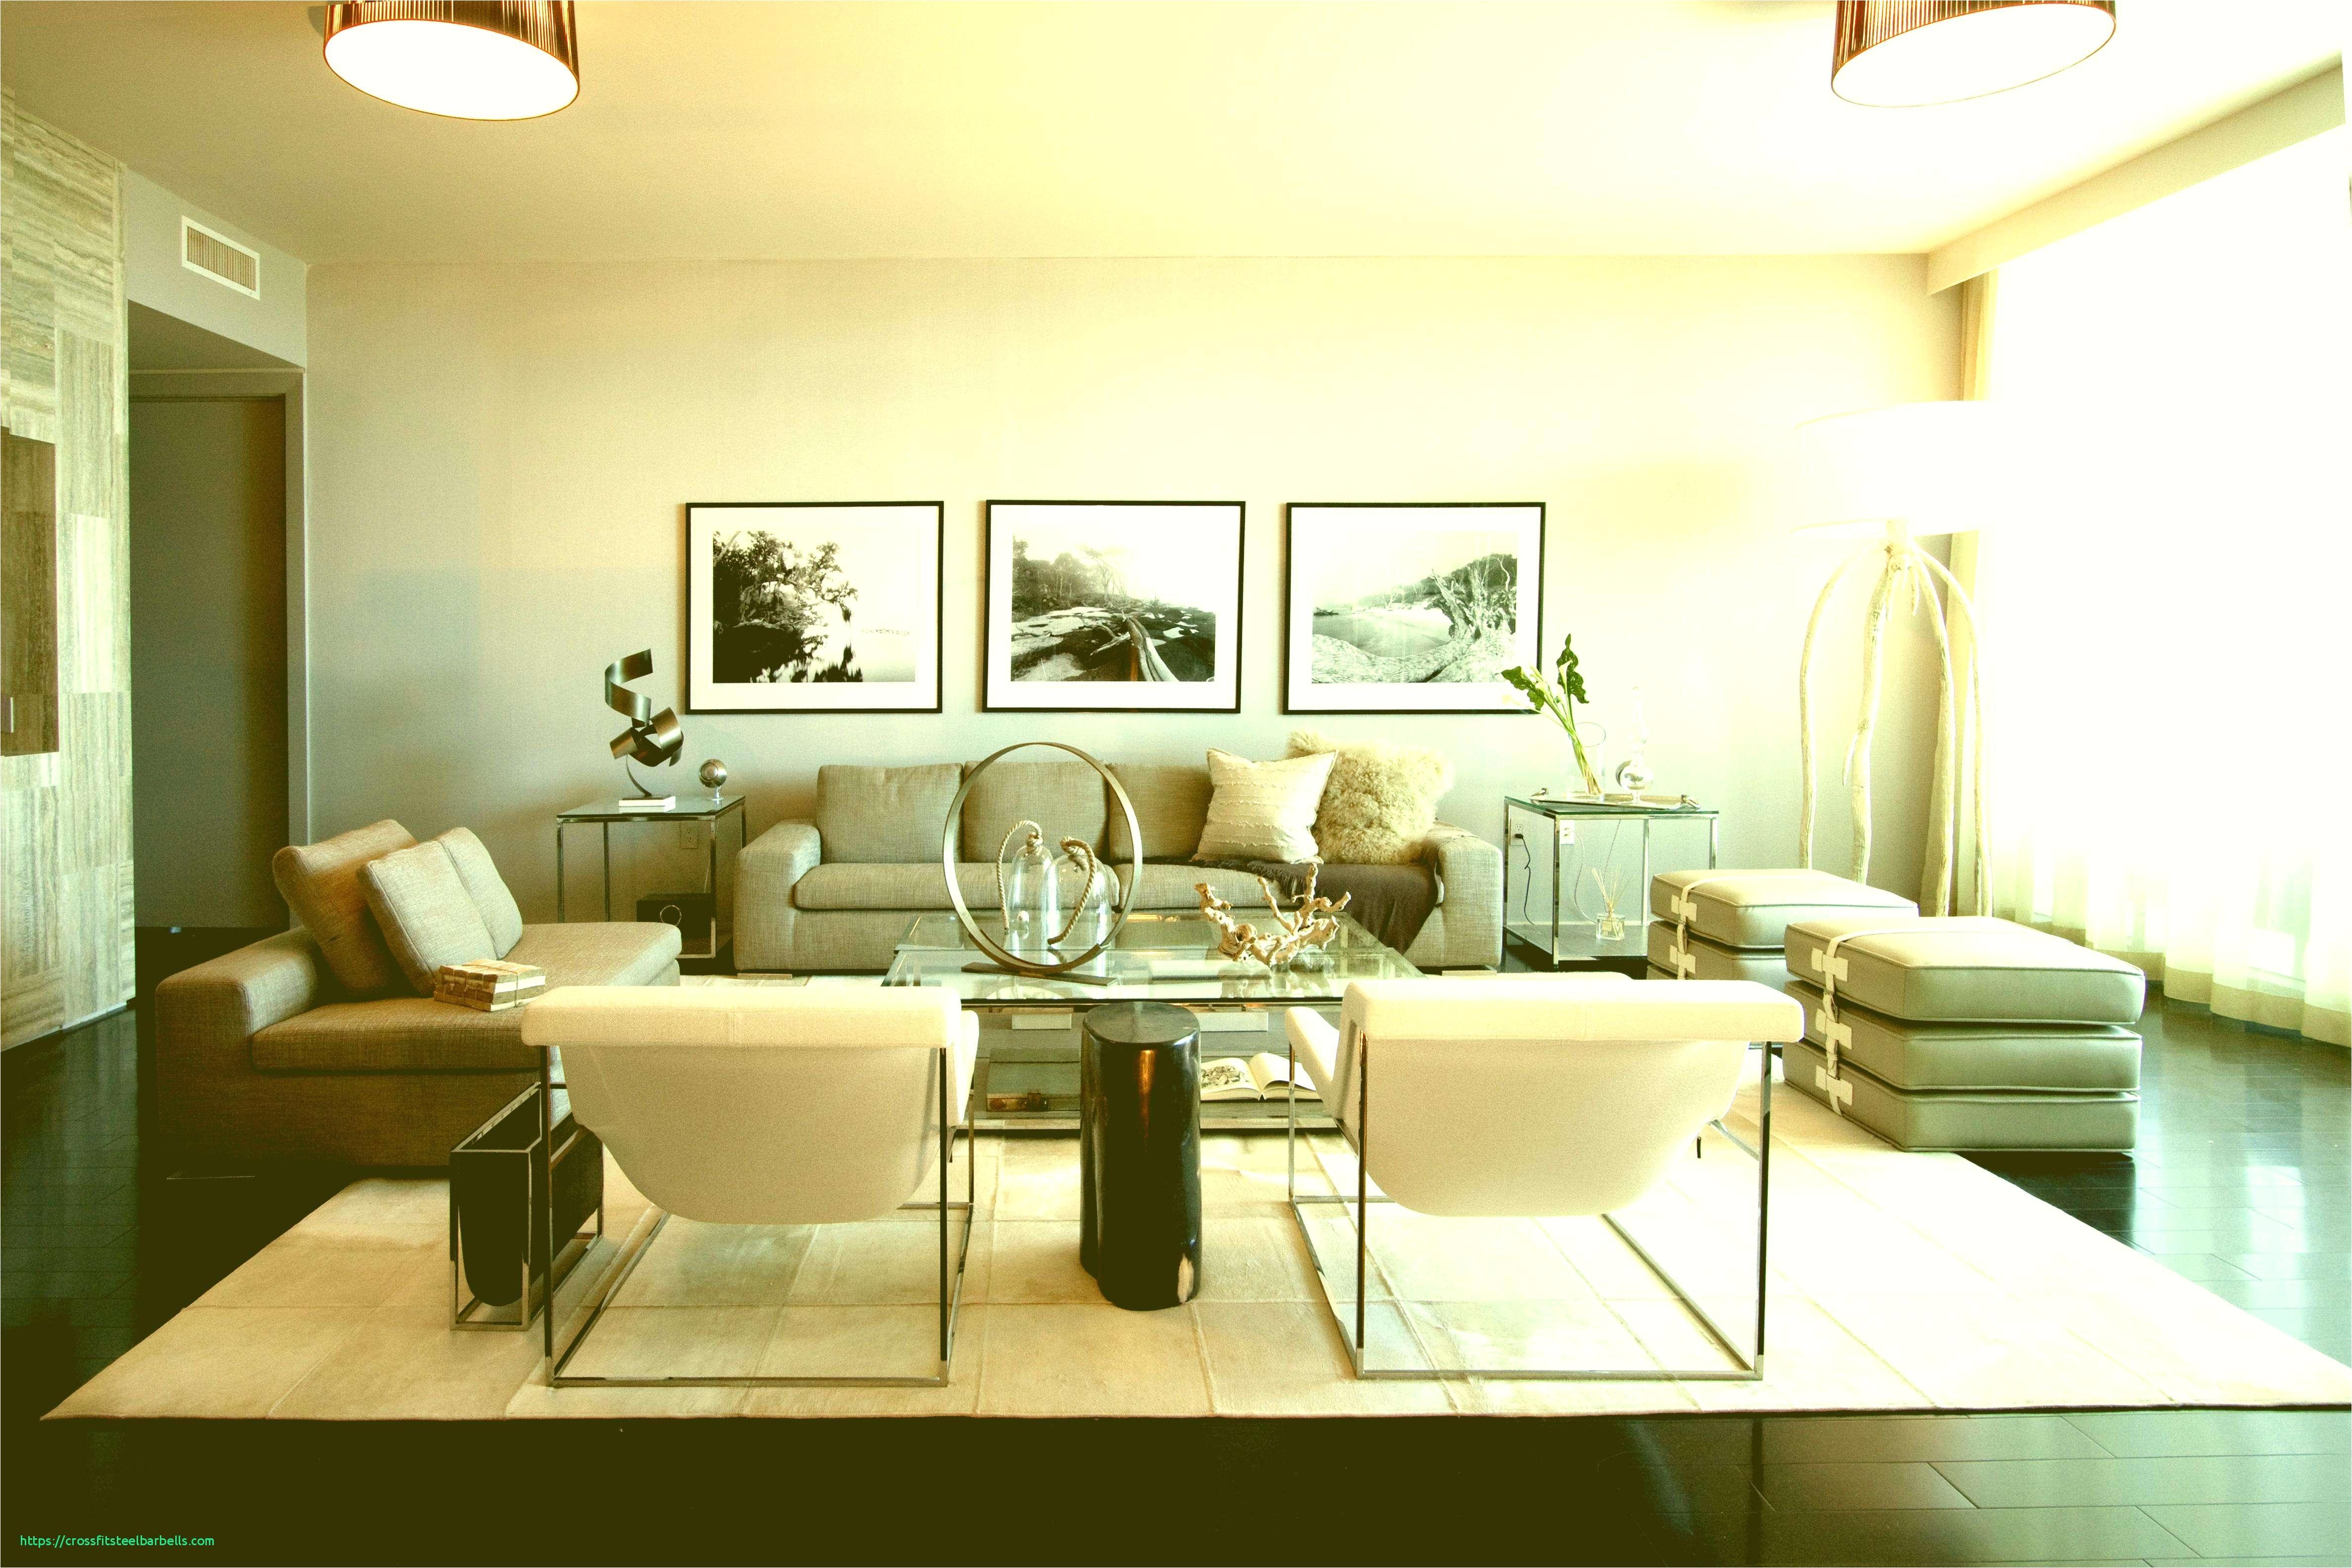 free online interior design courses with certificates uk luxury rh bradshomefurnishings com